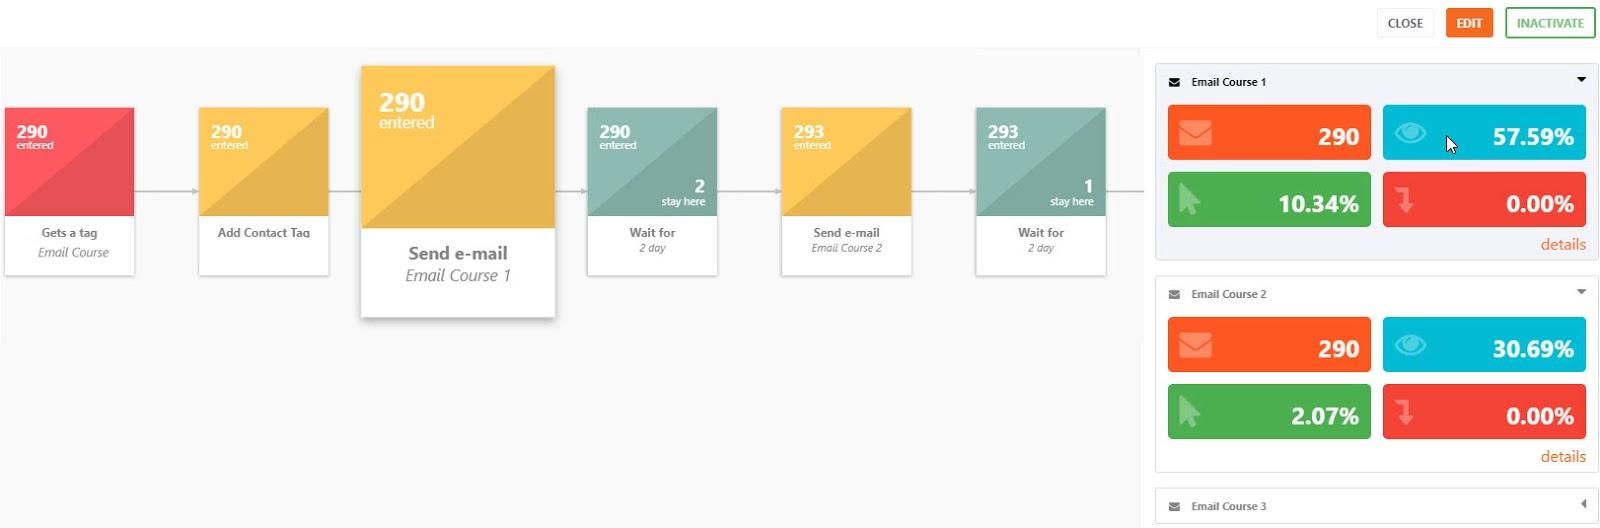 Workflow analytics